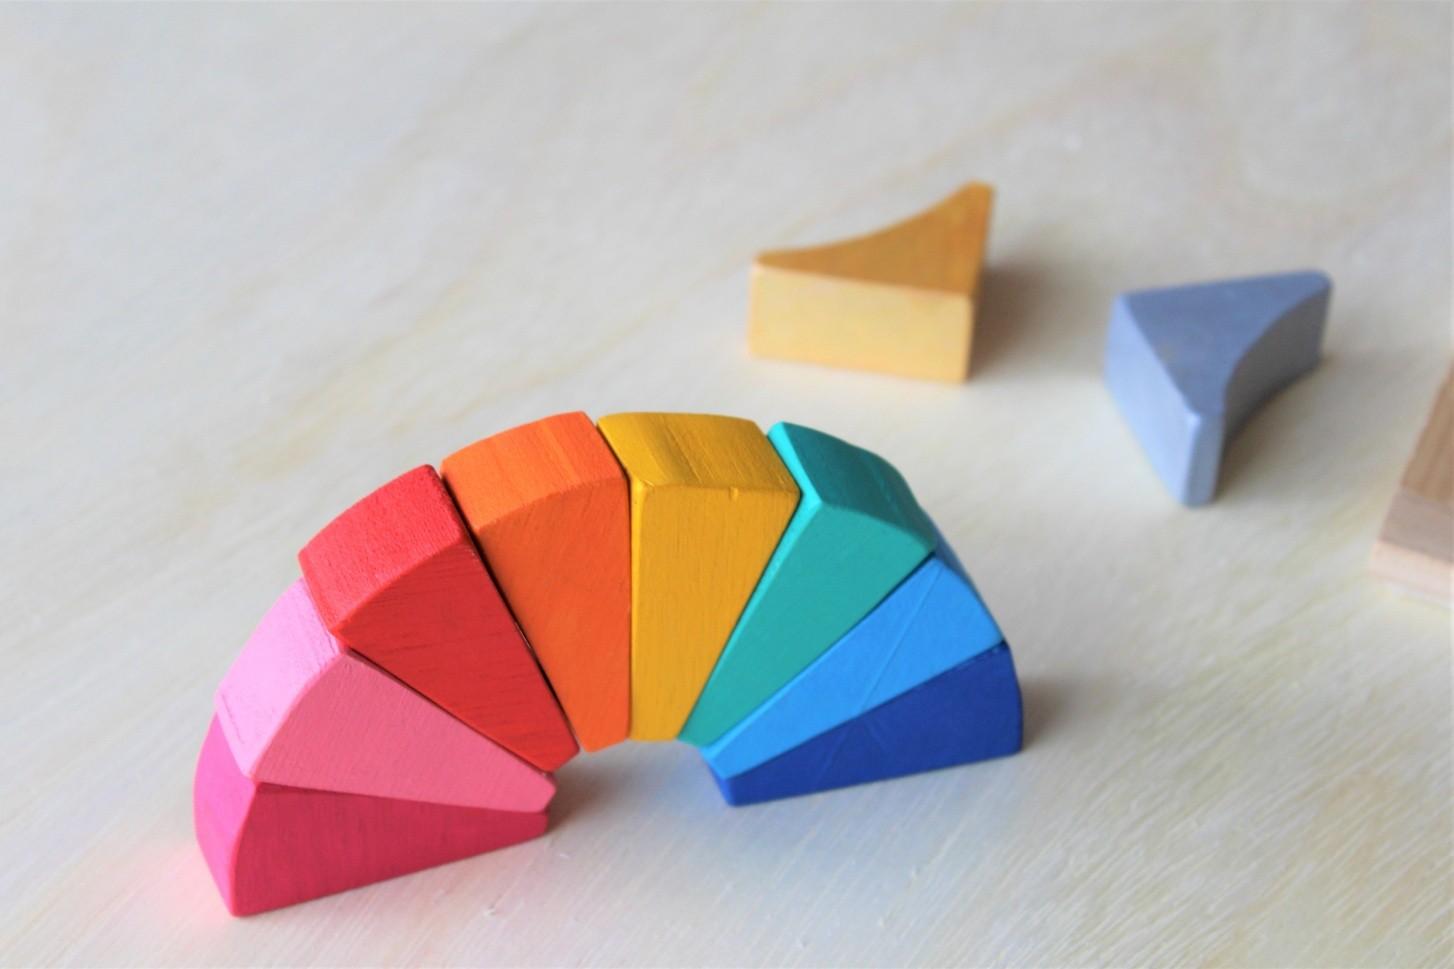 Kit Livro Pantone Colors + Conjunto de madeira Arco-Íris Diferente 2, Cód. LP022 + PP-014